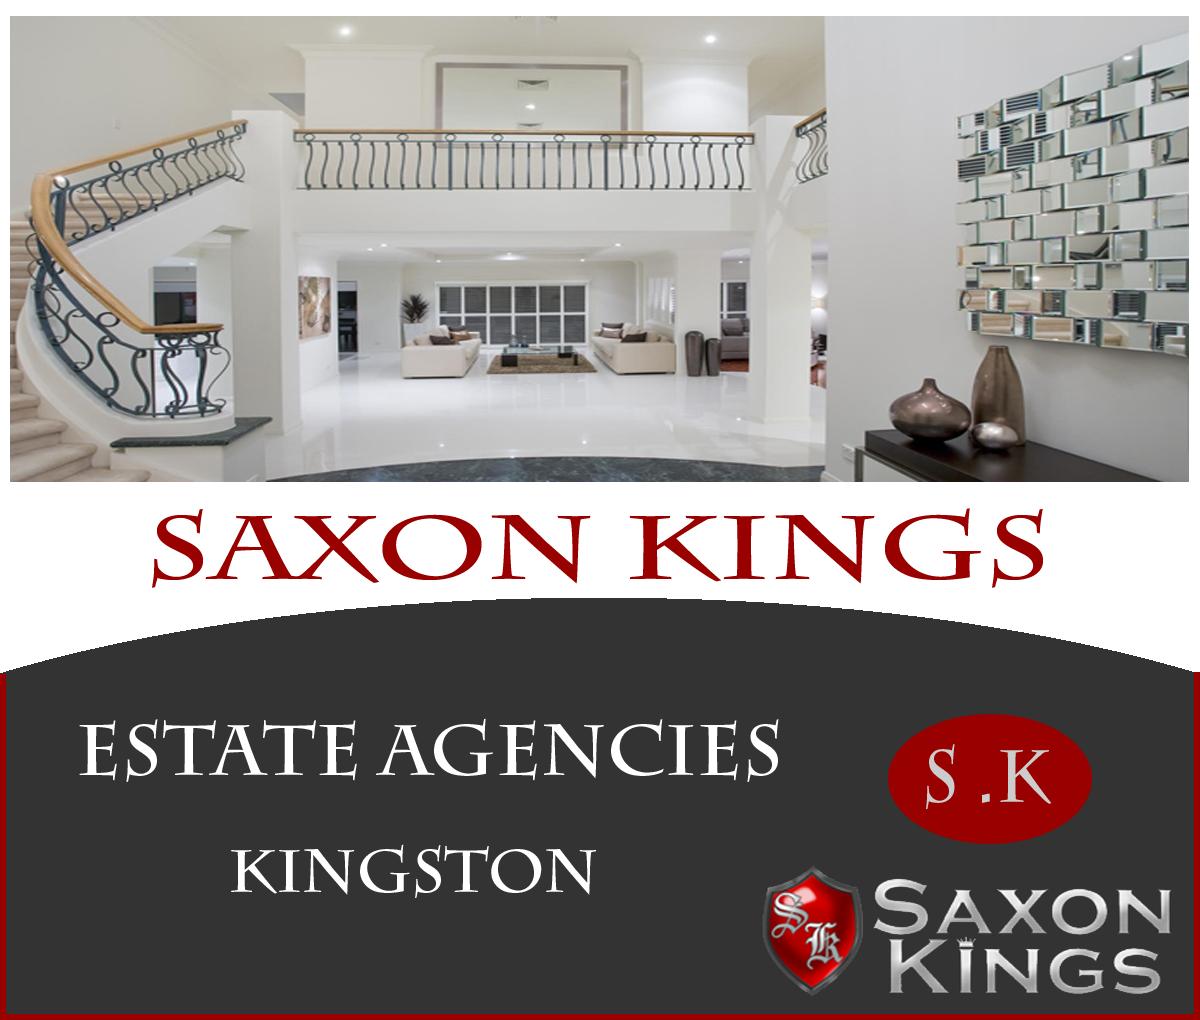 More detail about estate agencies kingston available visit at: http://saxonkings.co.uk/estate-agencies-kingston